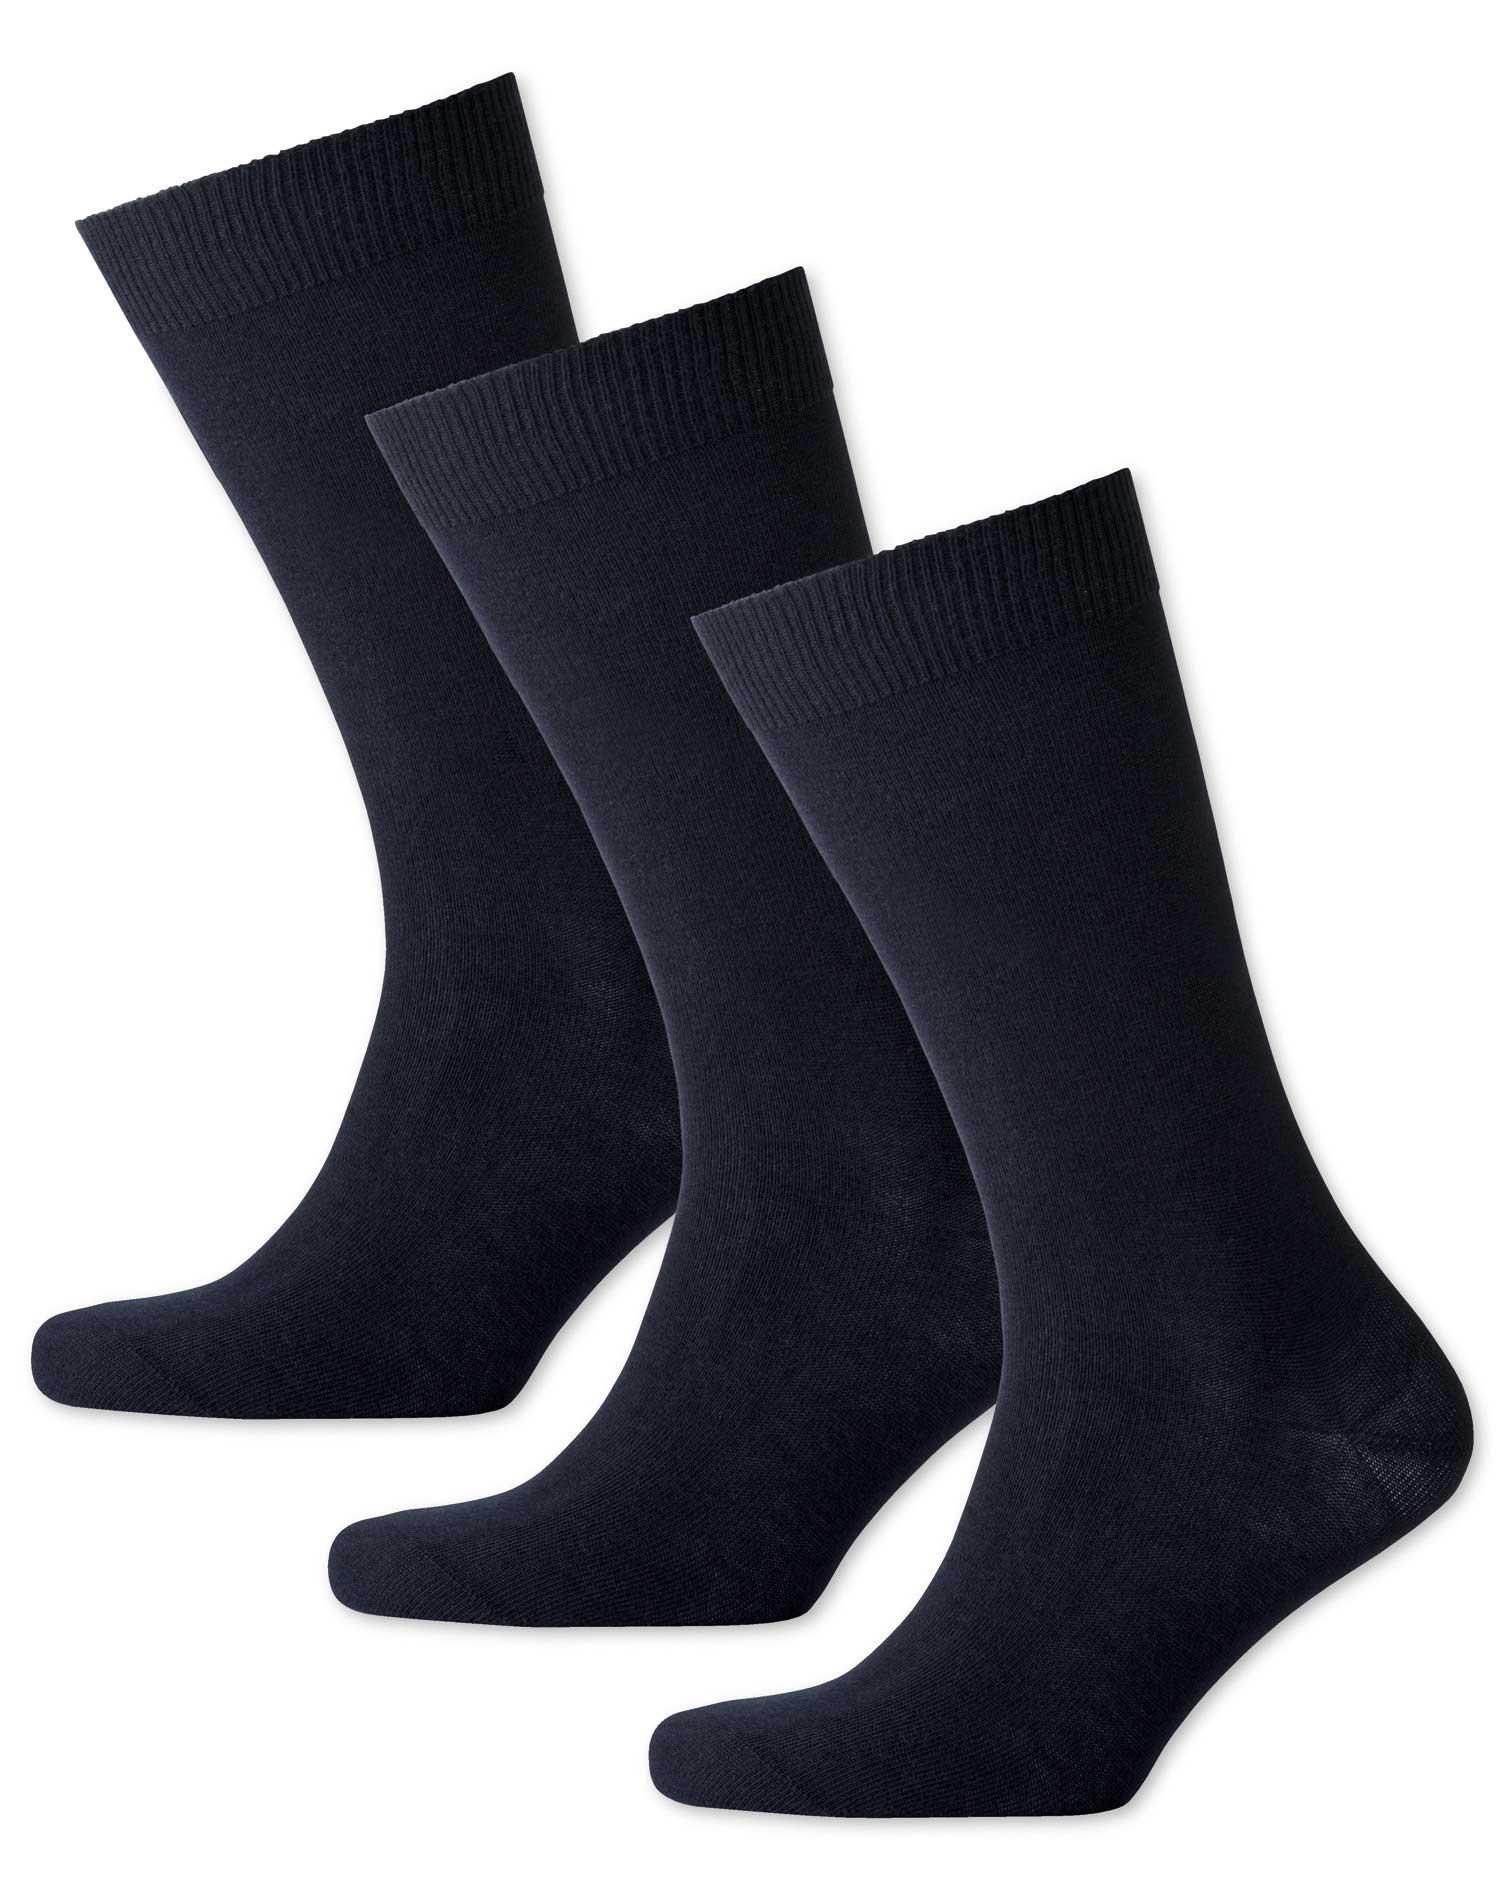 Navy Cotton Rich 3 Pack Socks Size Medium by Charles Tyrwhitt